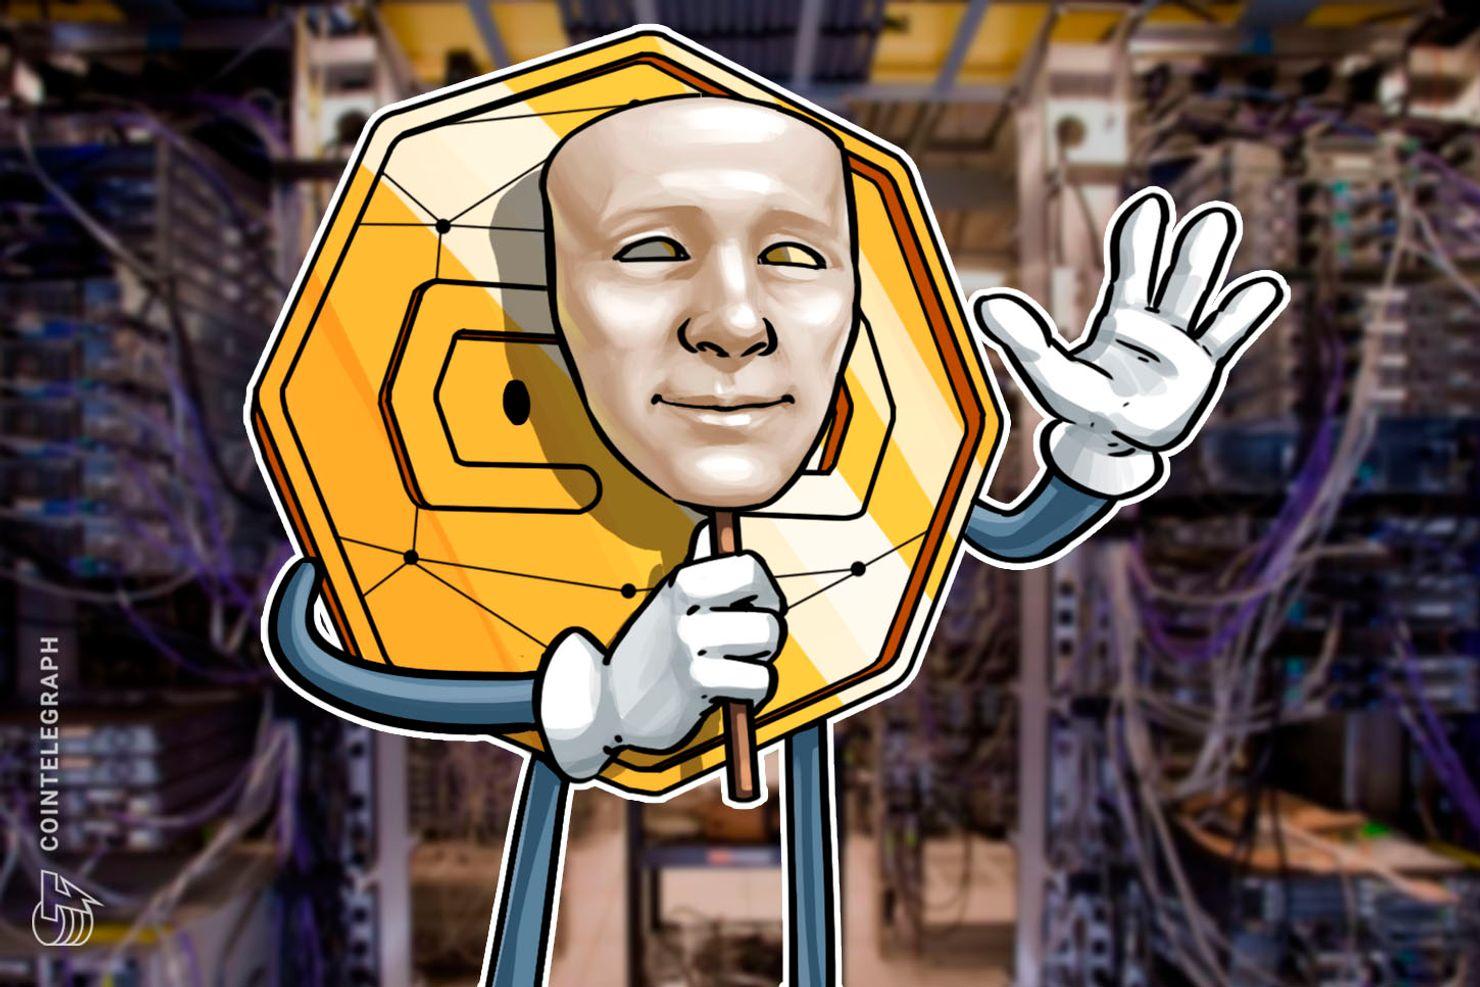 Haven Protocol Devs Reassure Community After 'Exit Scam' Concerns